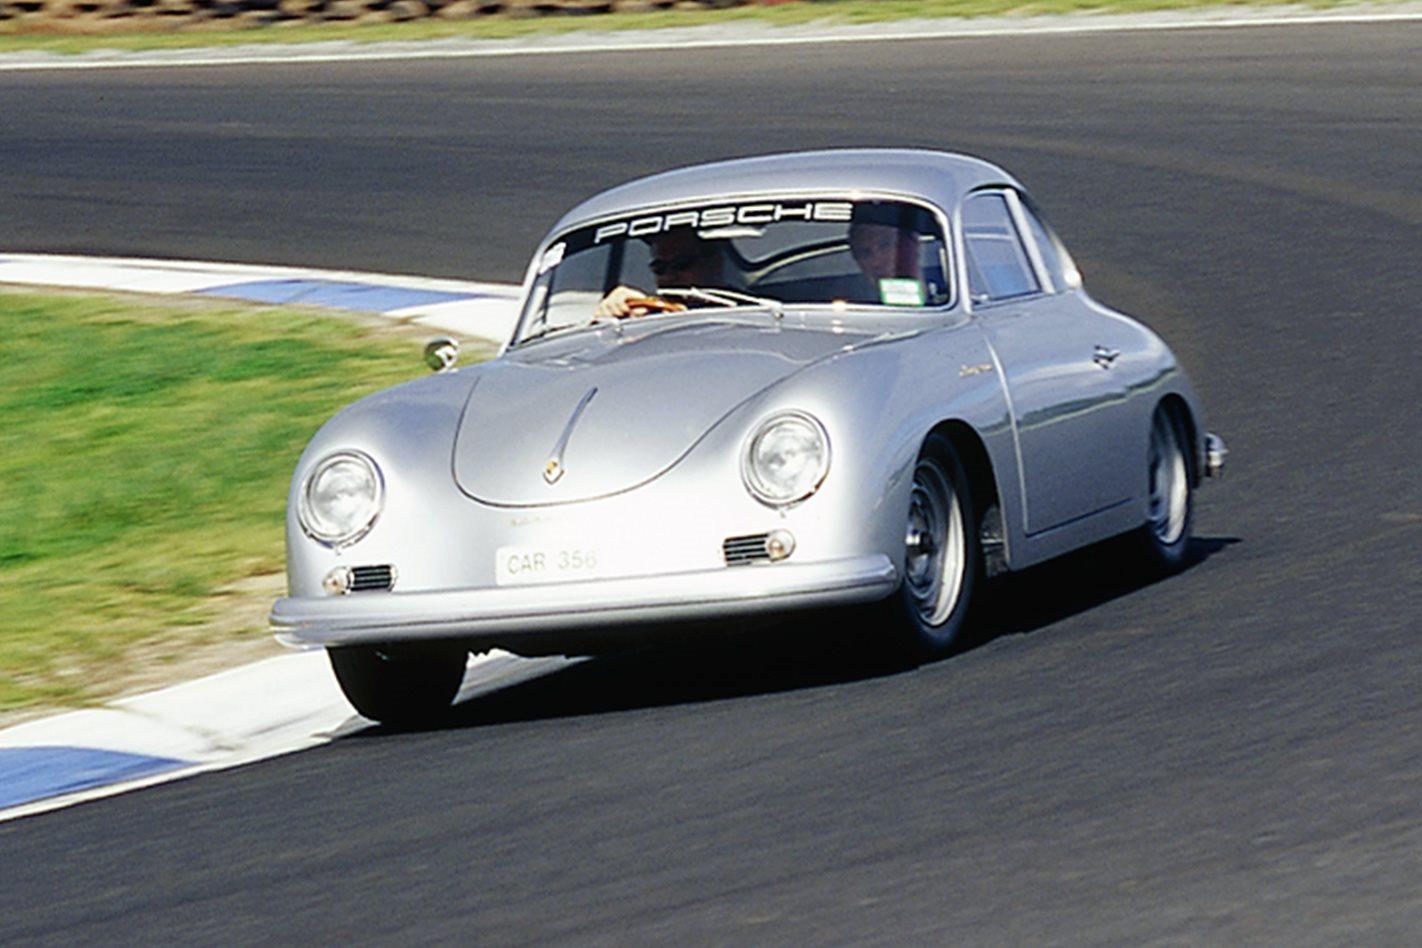 1955 Porsche's 356 Carrera